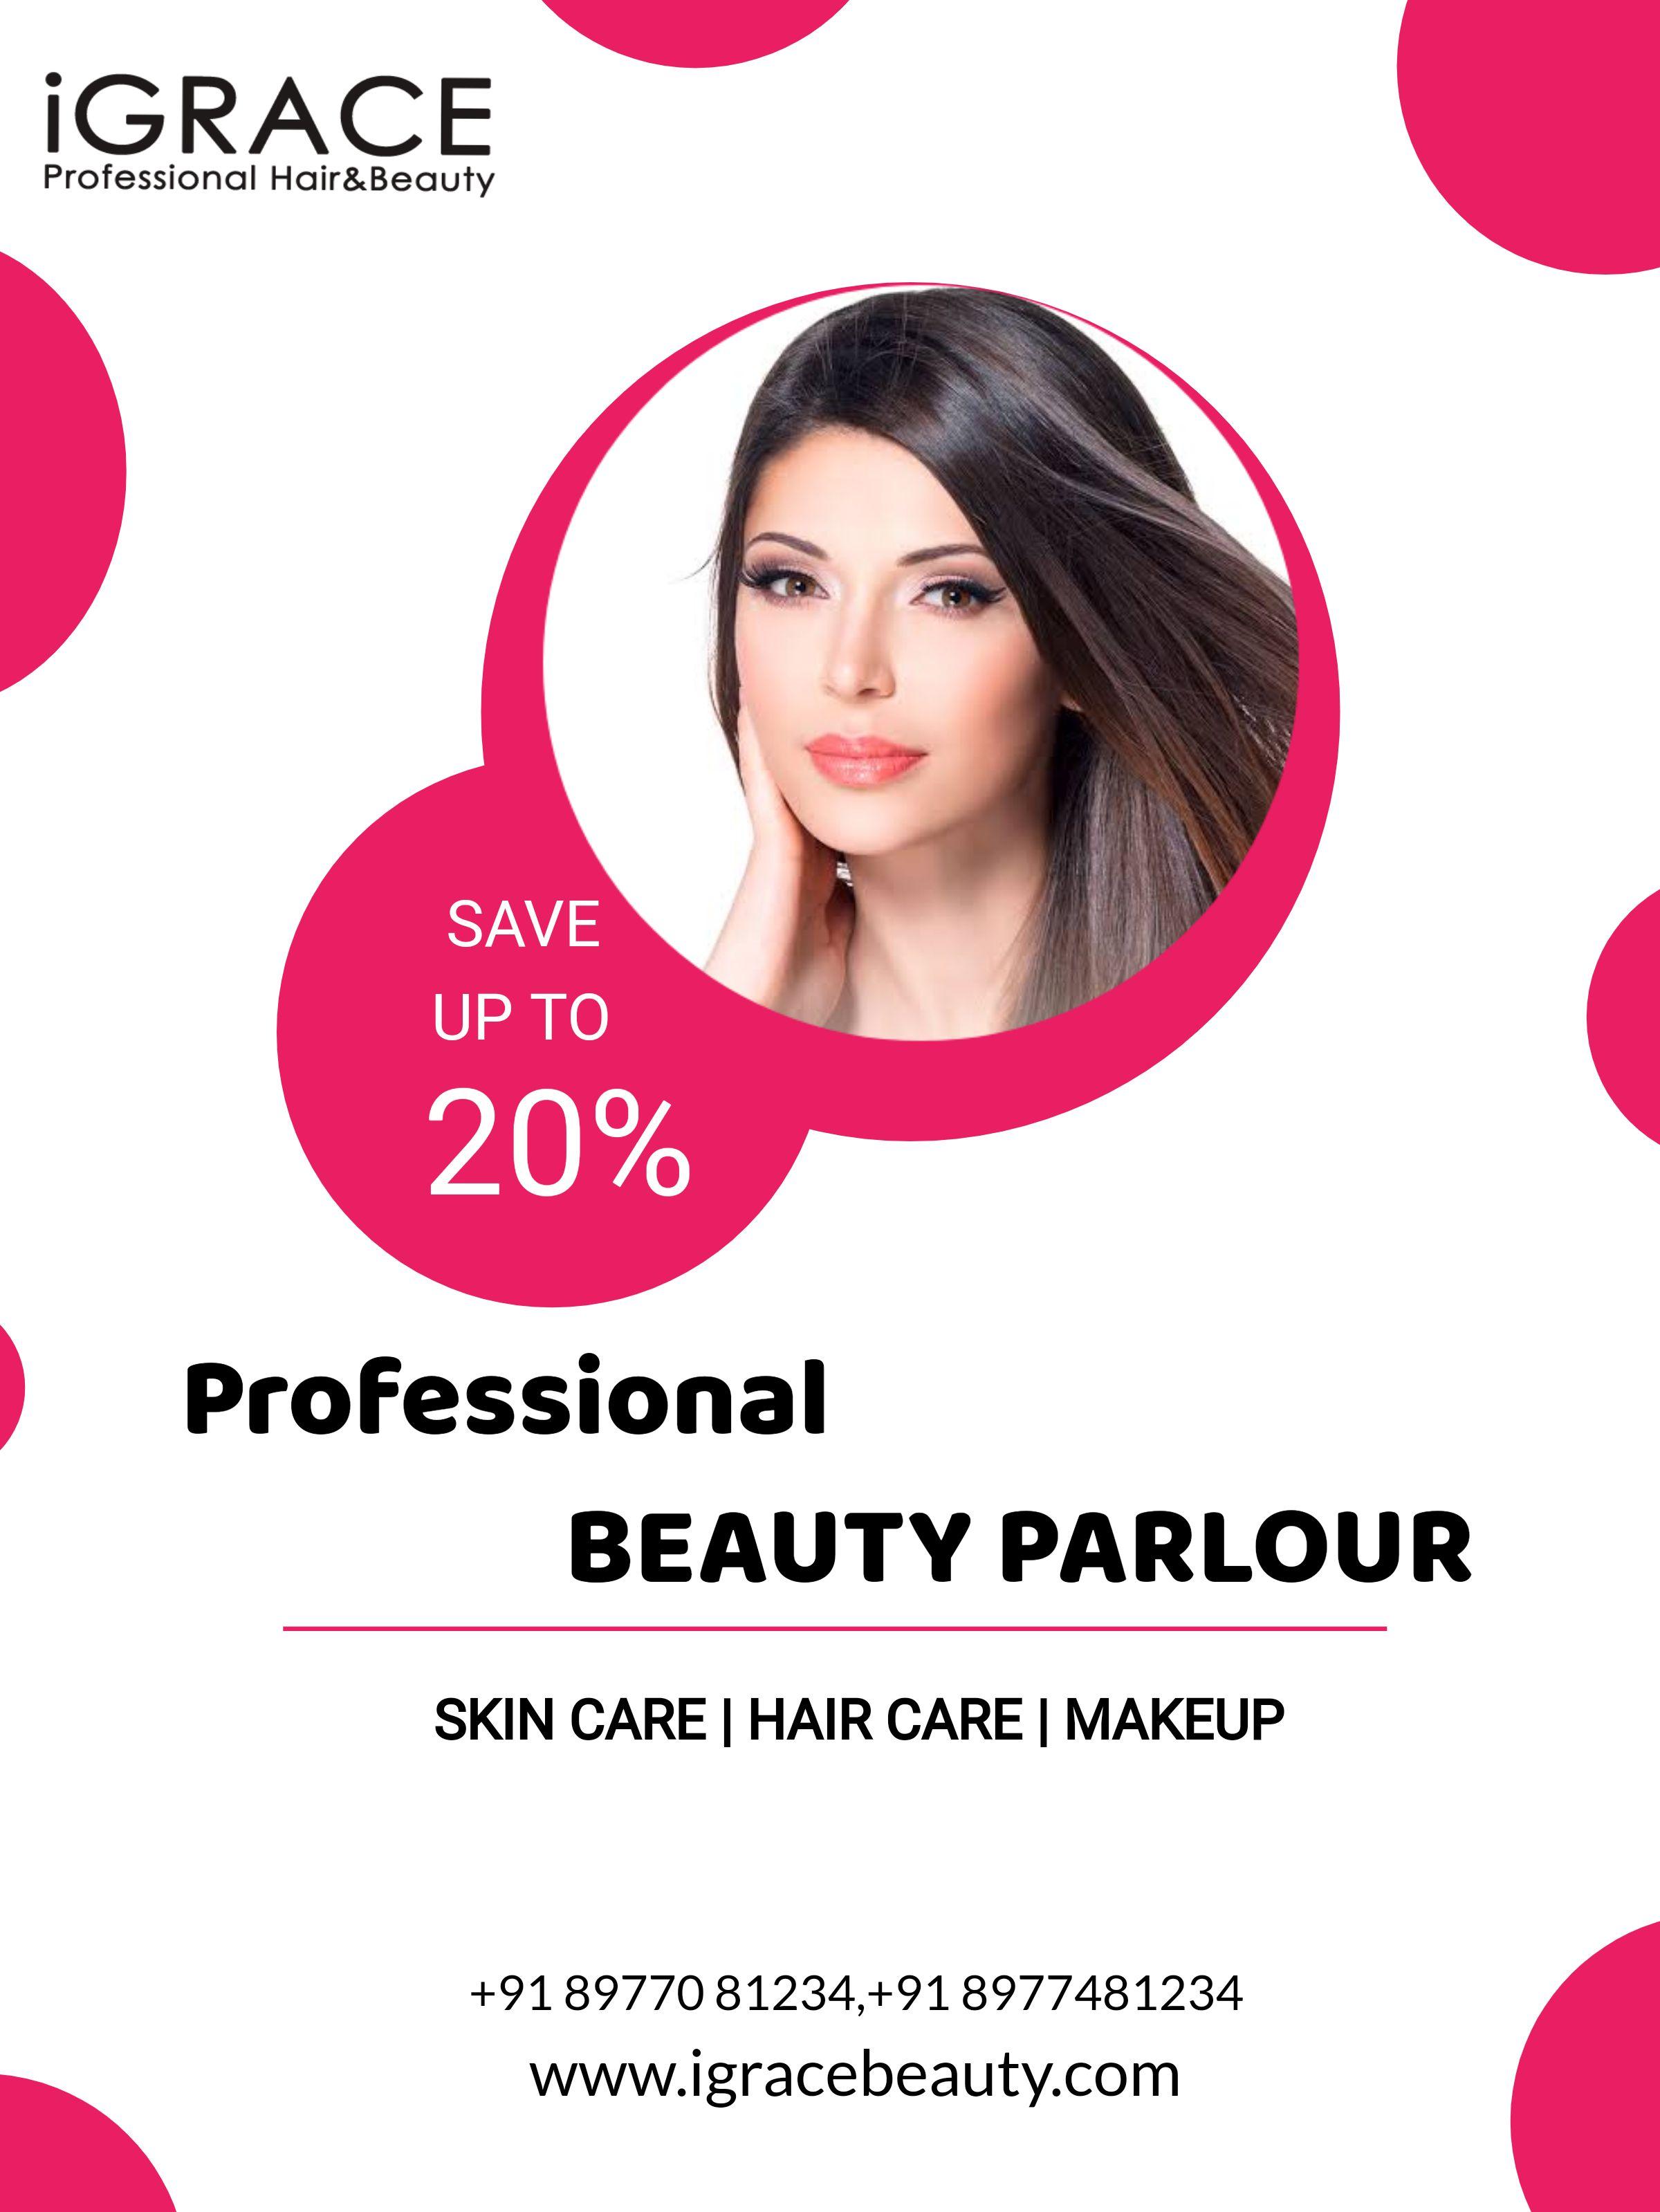 Beauty Parlour Services In Vizag Bridal Makeup Services Best Makeup Products Makeup Services